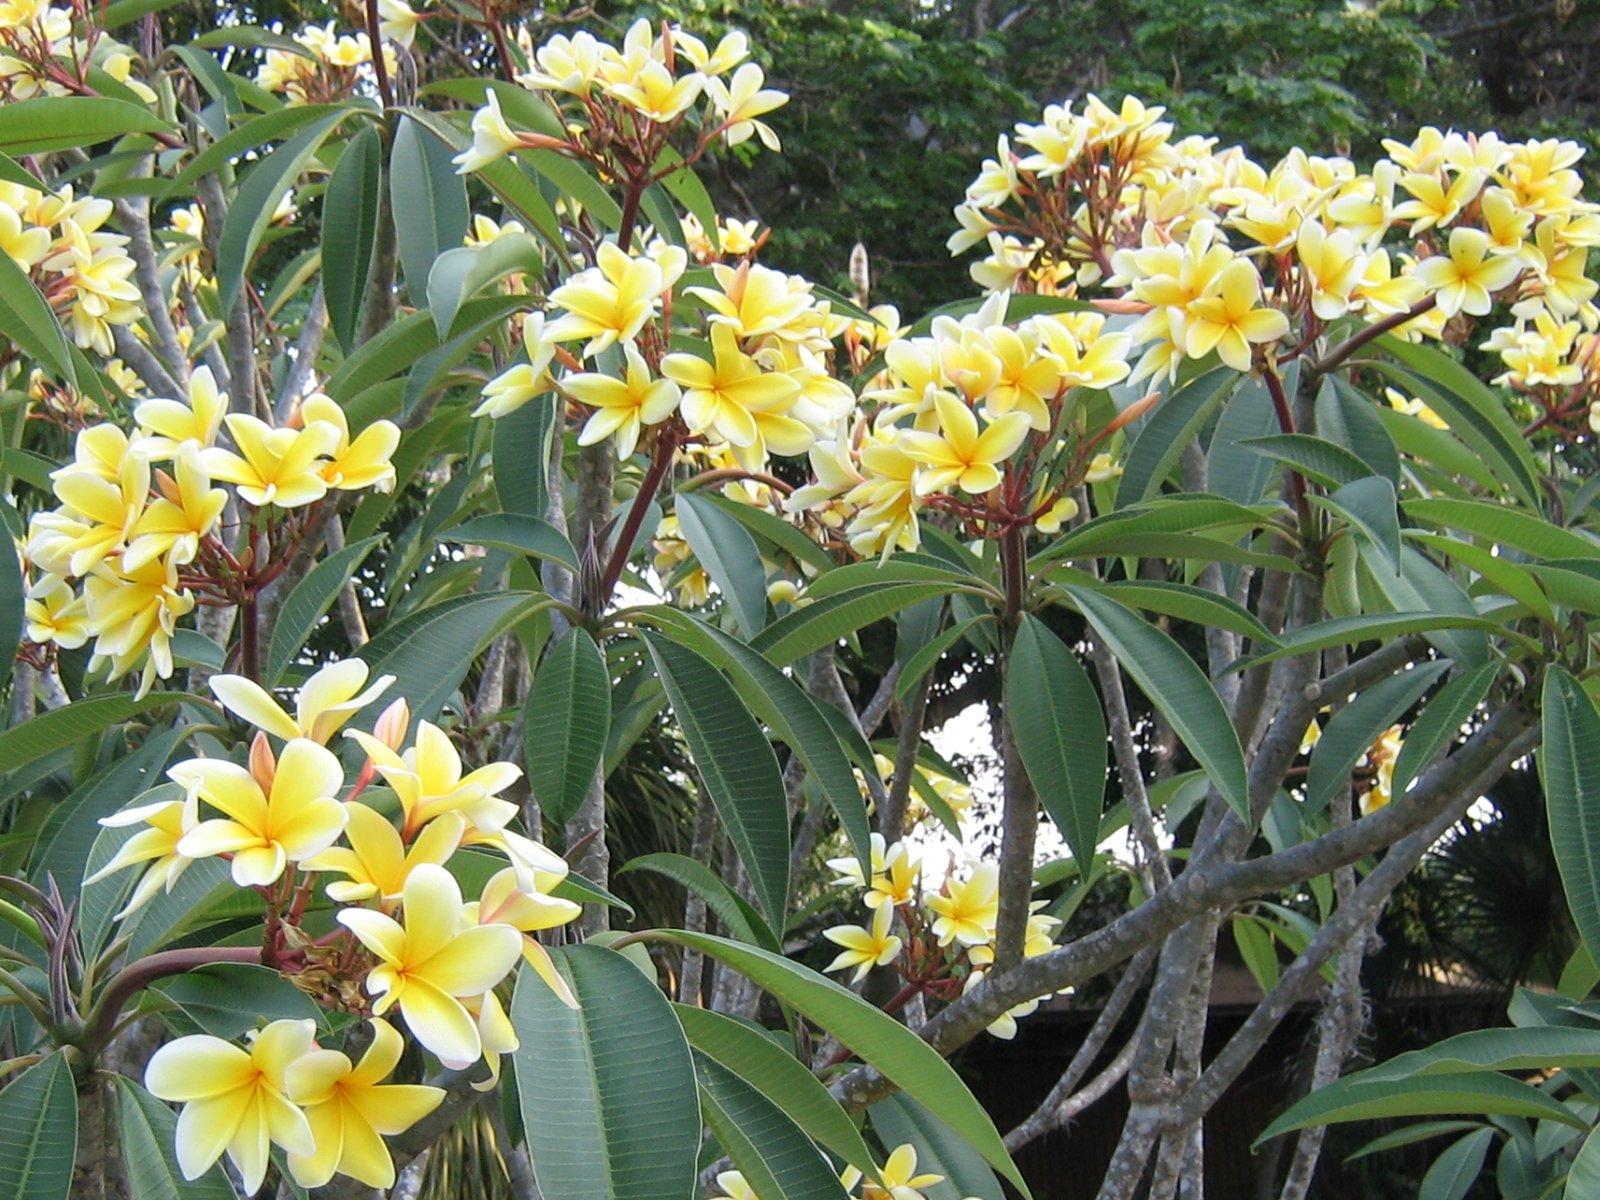 Yellow Hawaiian Plumeria Cutting - Apx. 9 - 12 inches long #C1 by Discount Hawaiian Gifts